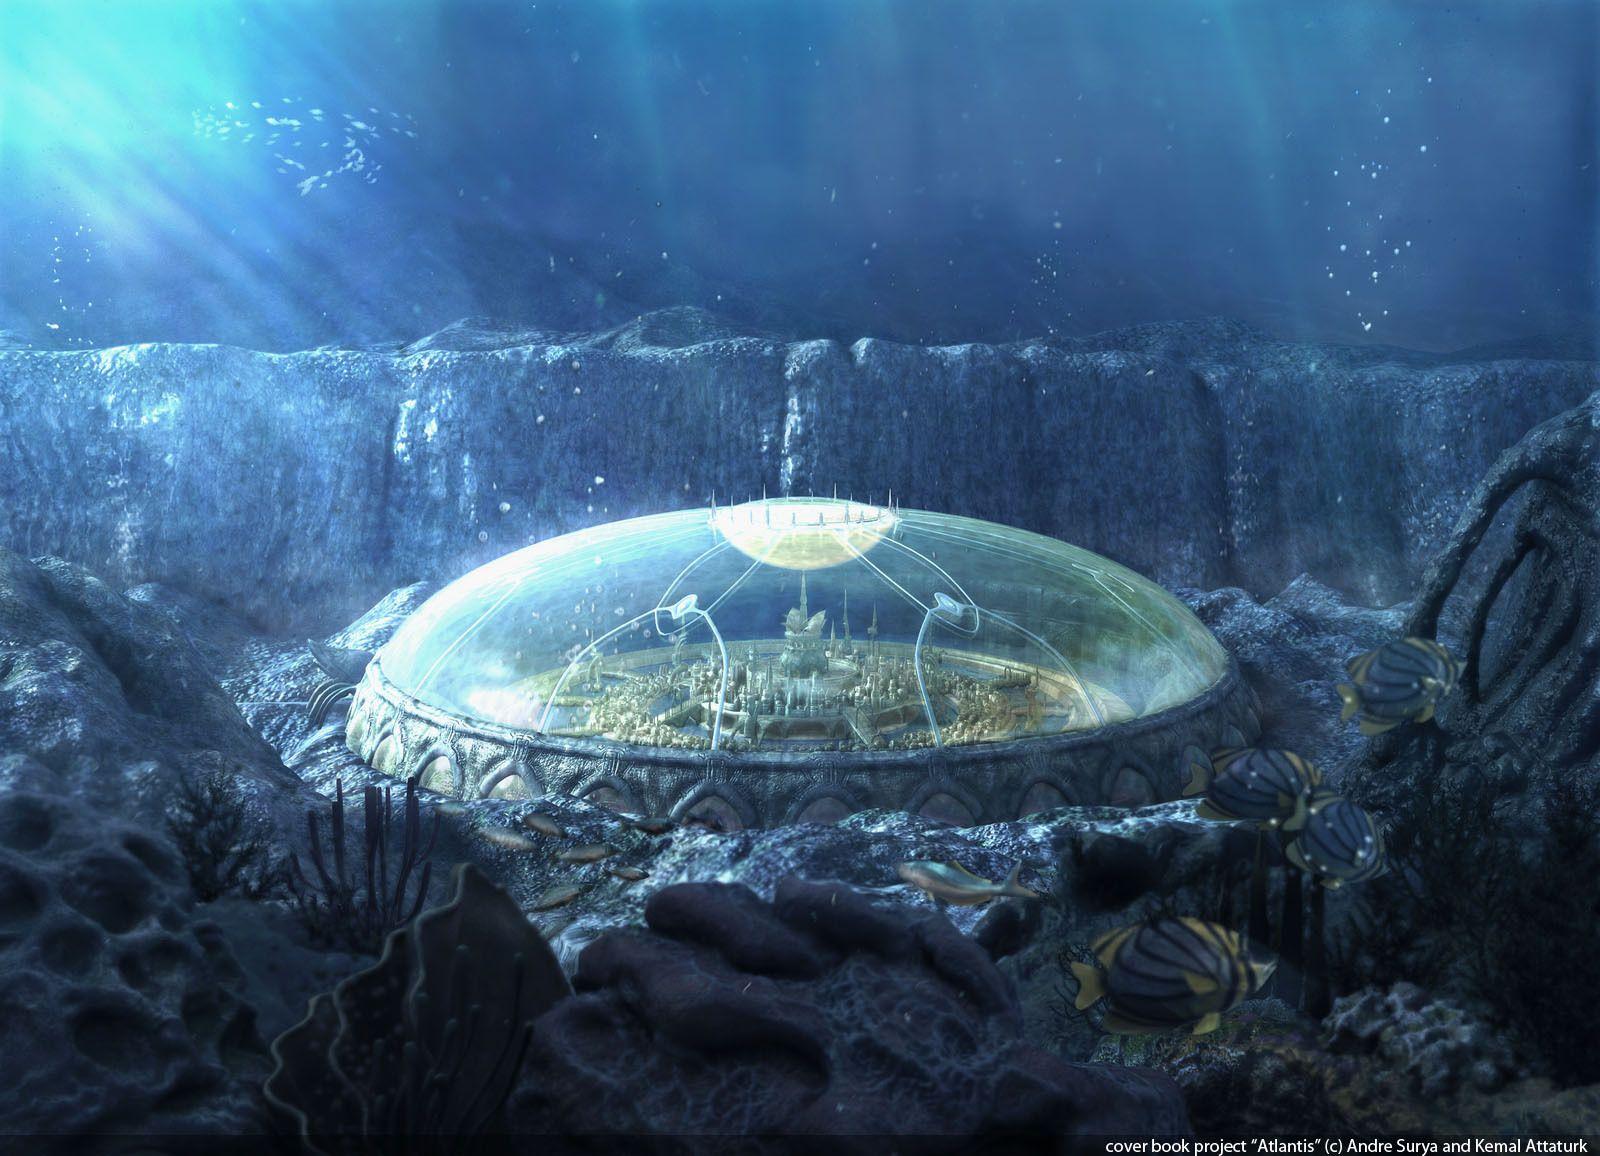 17 Best images about Atlantis on Pinterest   Civilization  Underwater city  and Fantasy city. 17 Best images about Atlantis on Pinterest   Civilization